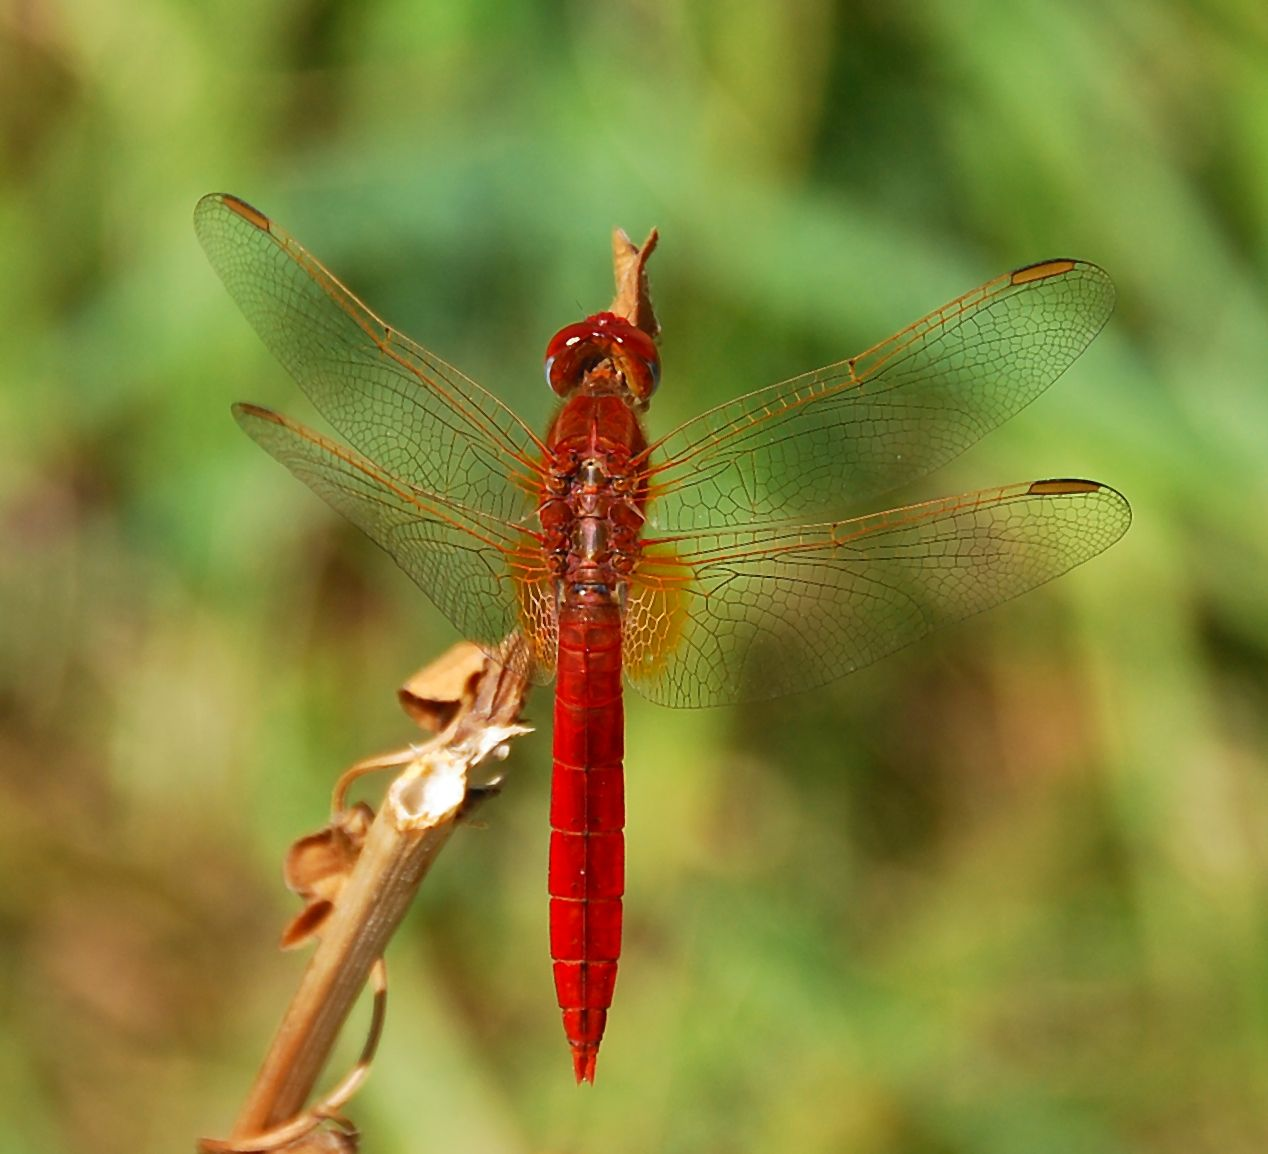 Pin by 楊乃耀 on 蜻蜓